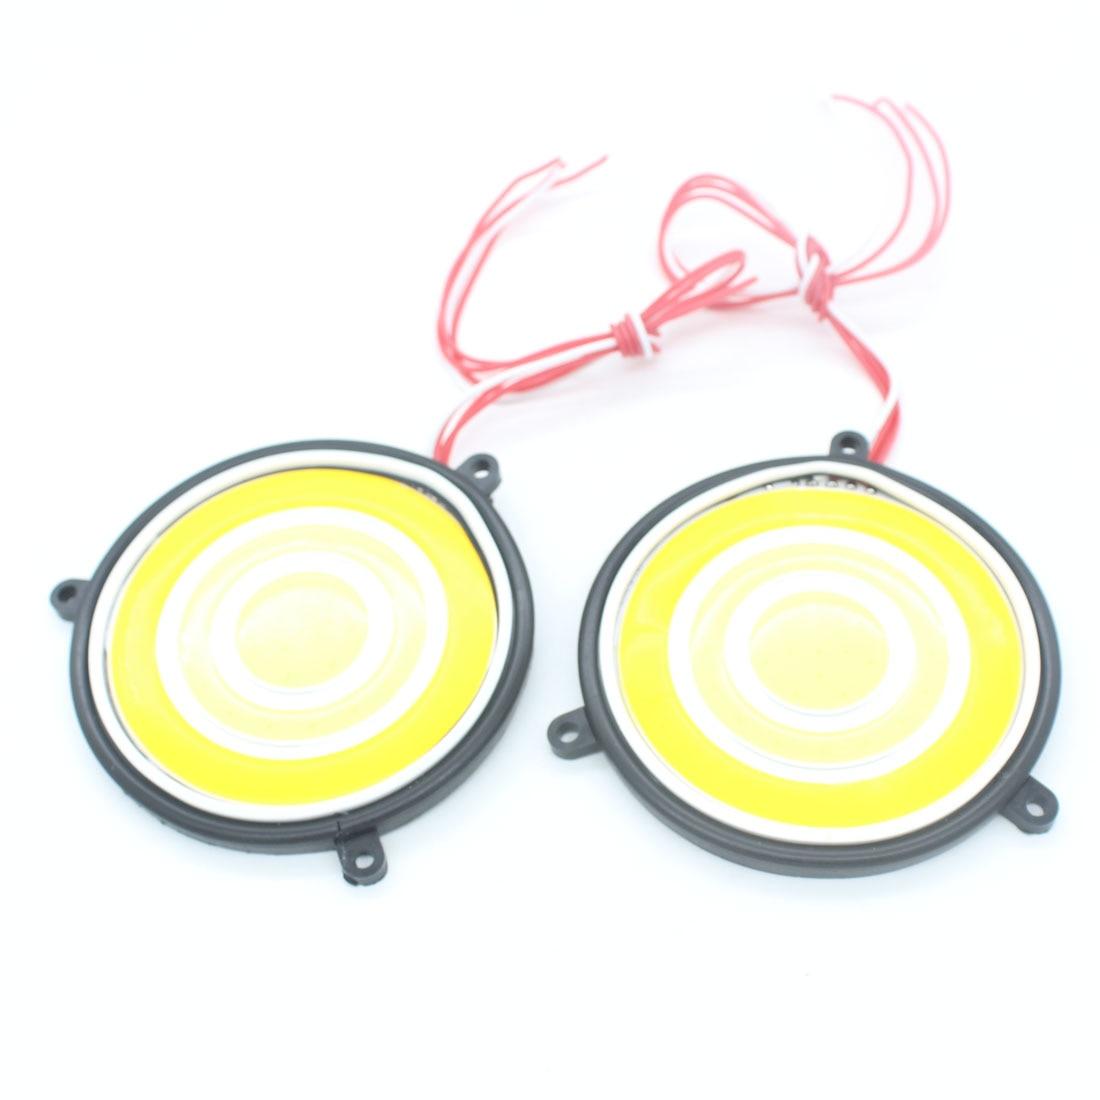 2X LED Car COB Daytime Running Light DRL Driving Fog Light Source 12V Turn Signal Reverse Backup Light Xenon Lamp Auto Bulb<br><br>Aliexpress